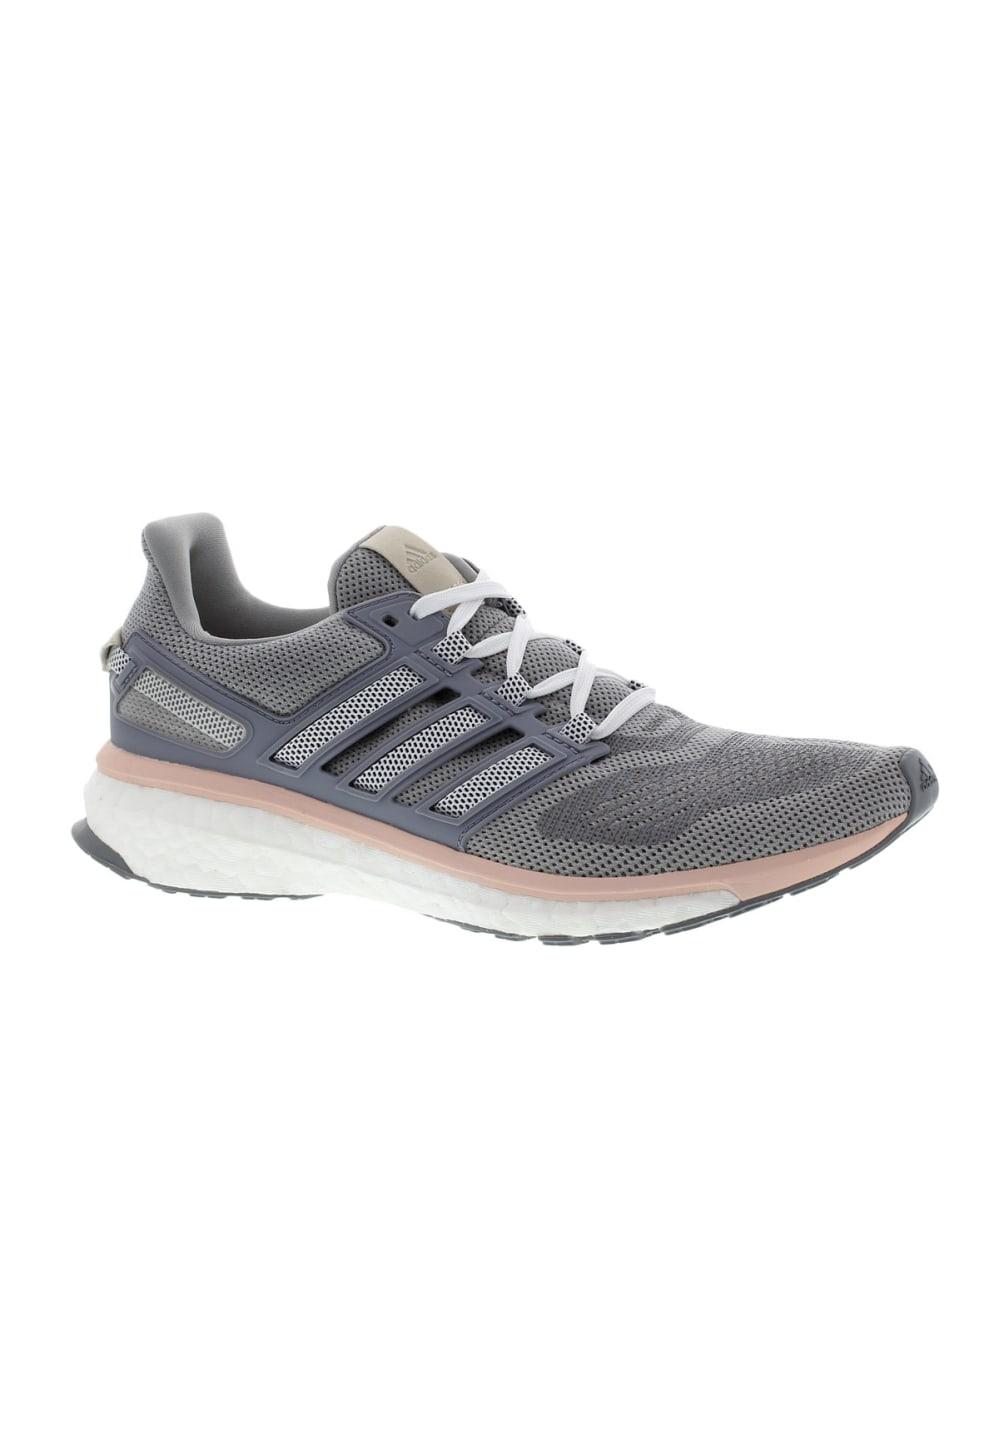 new style 508d8 d2916 21run Für Laufschuhe Grau 3 Damen Energy Boost Adidas qzASwR